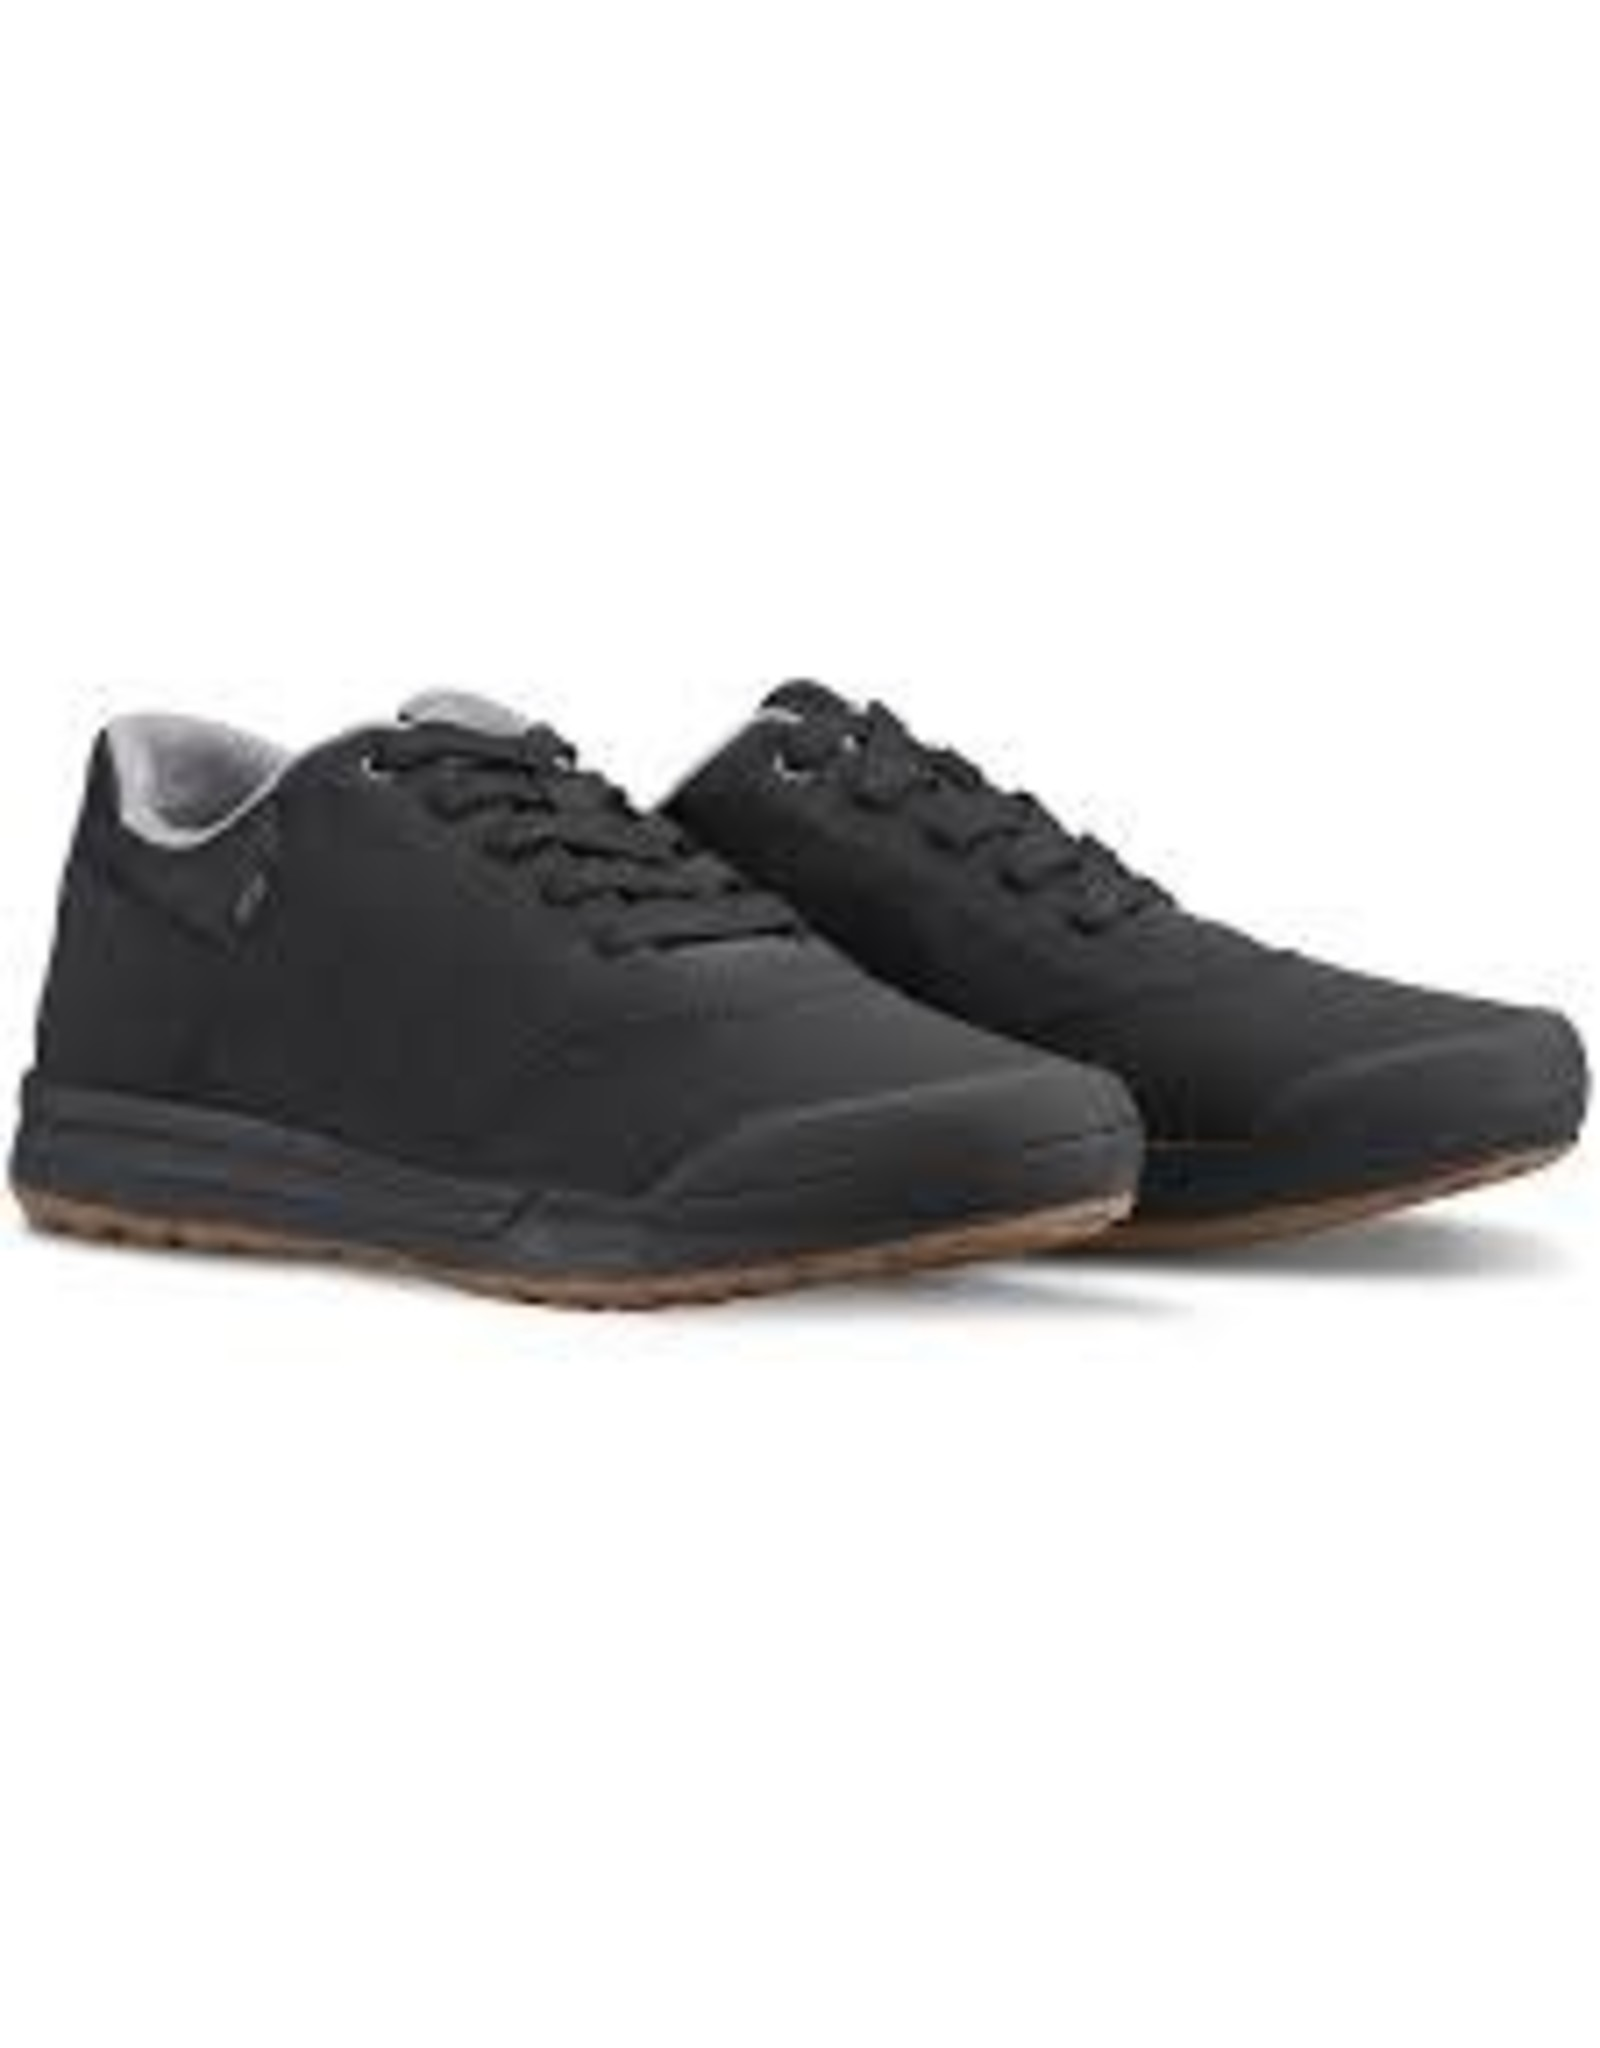 Specialized Shoe Spec 2FO Roost SPD 43.5 Black/Gum